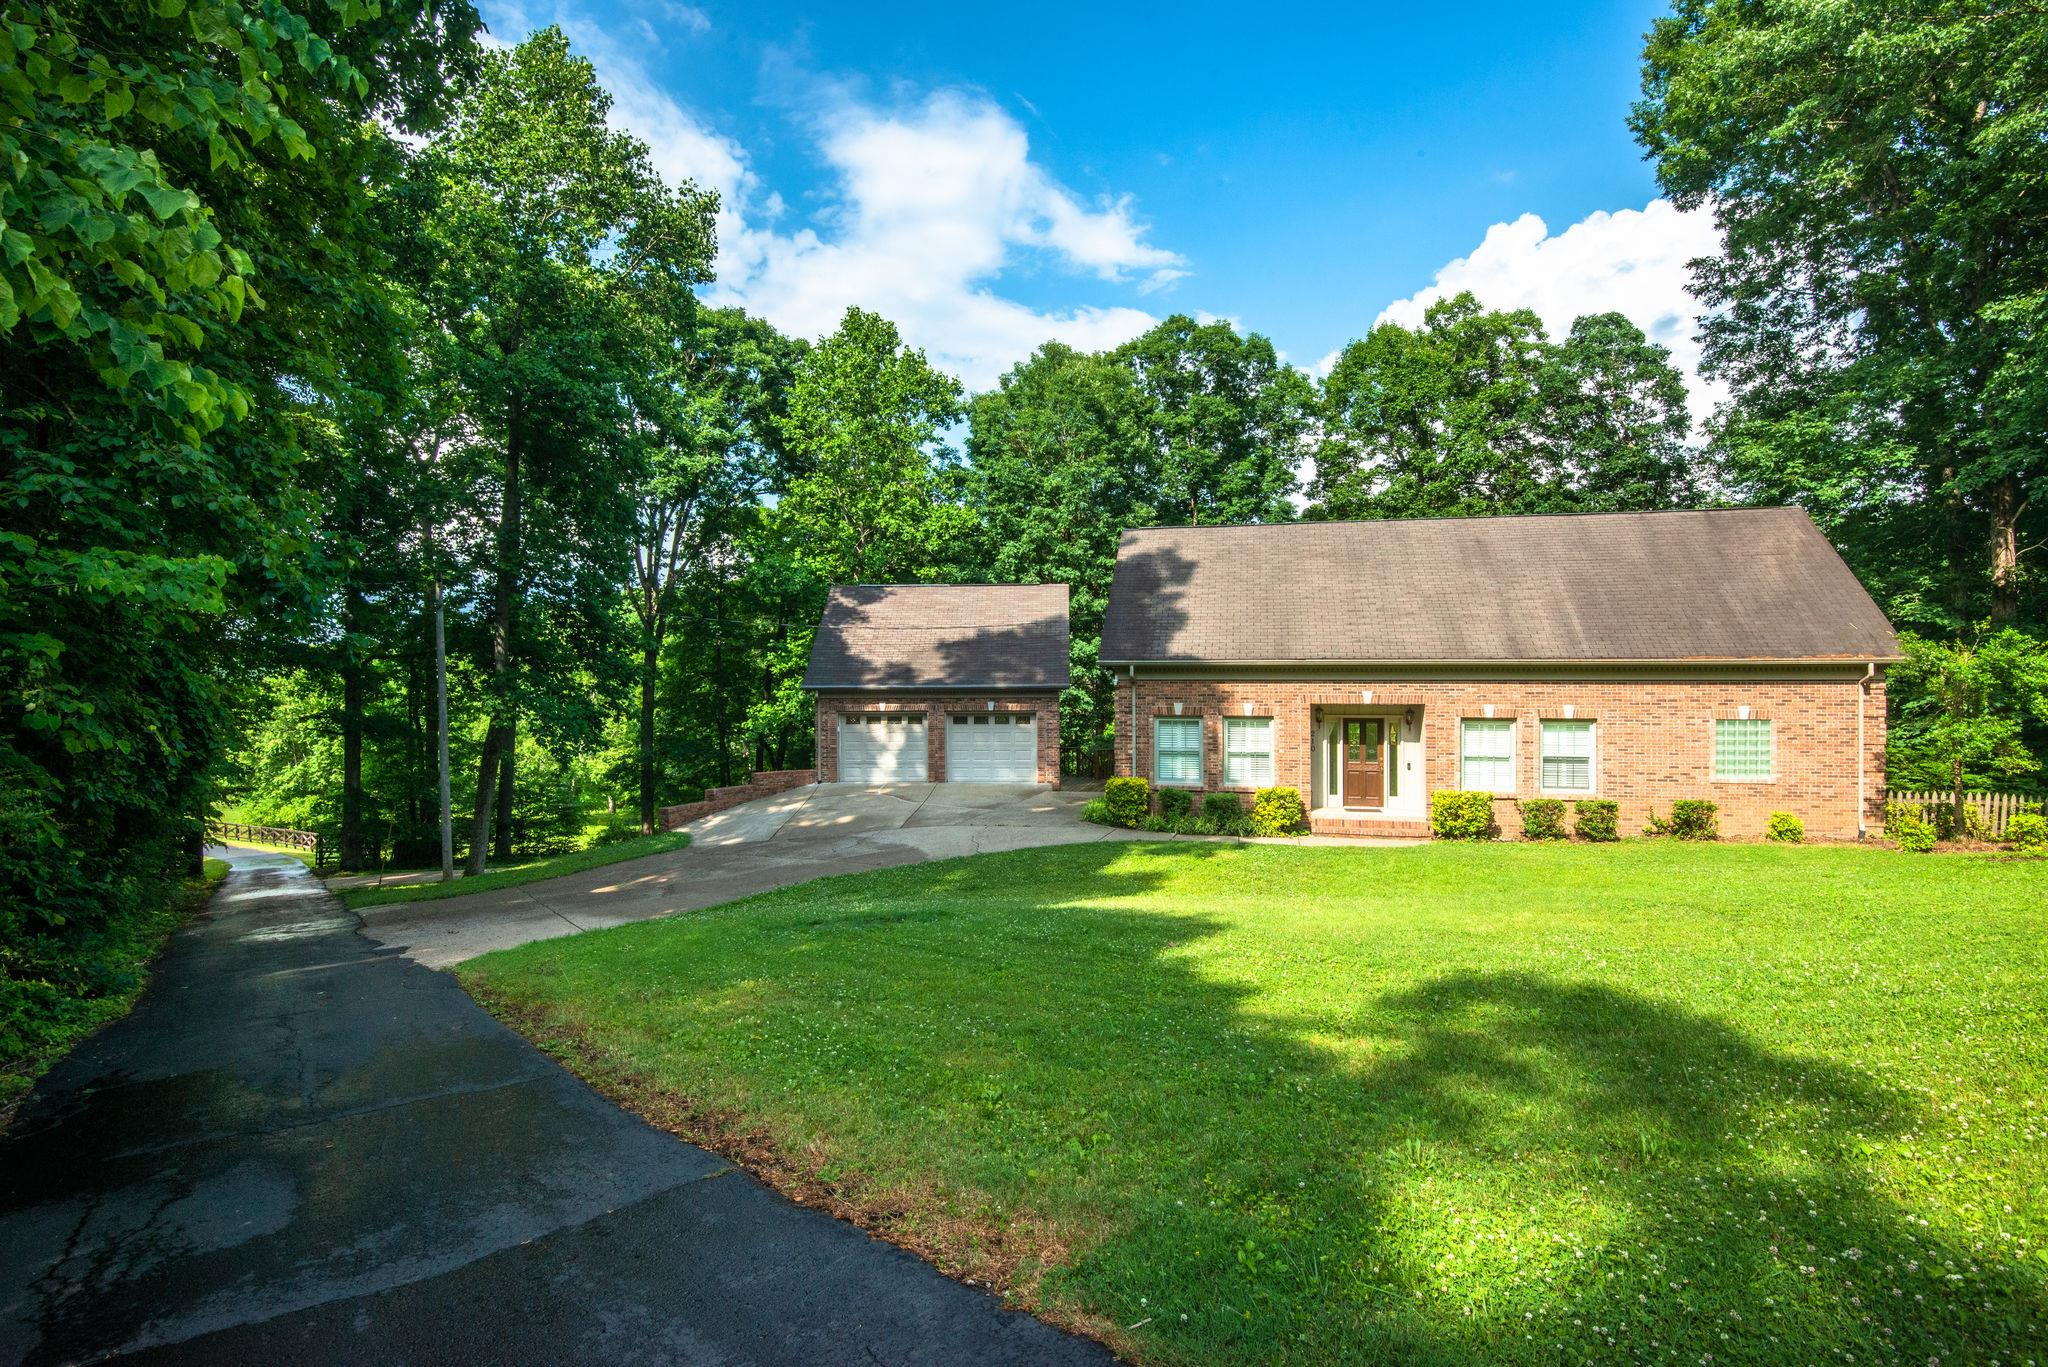 210 Kimberly Dr, Dickson, TN 37055 - Dickson, TN real estate listing